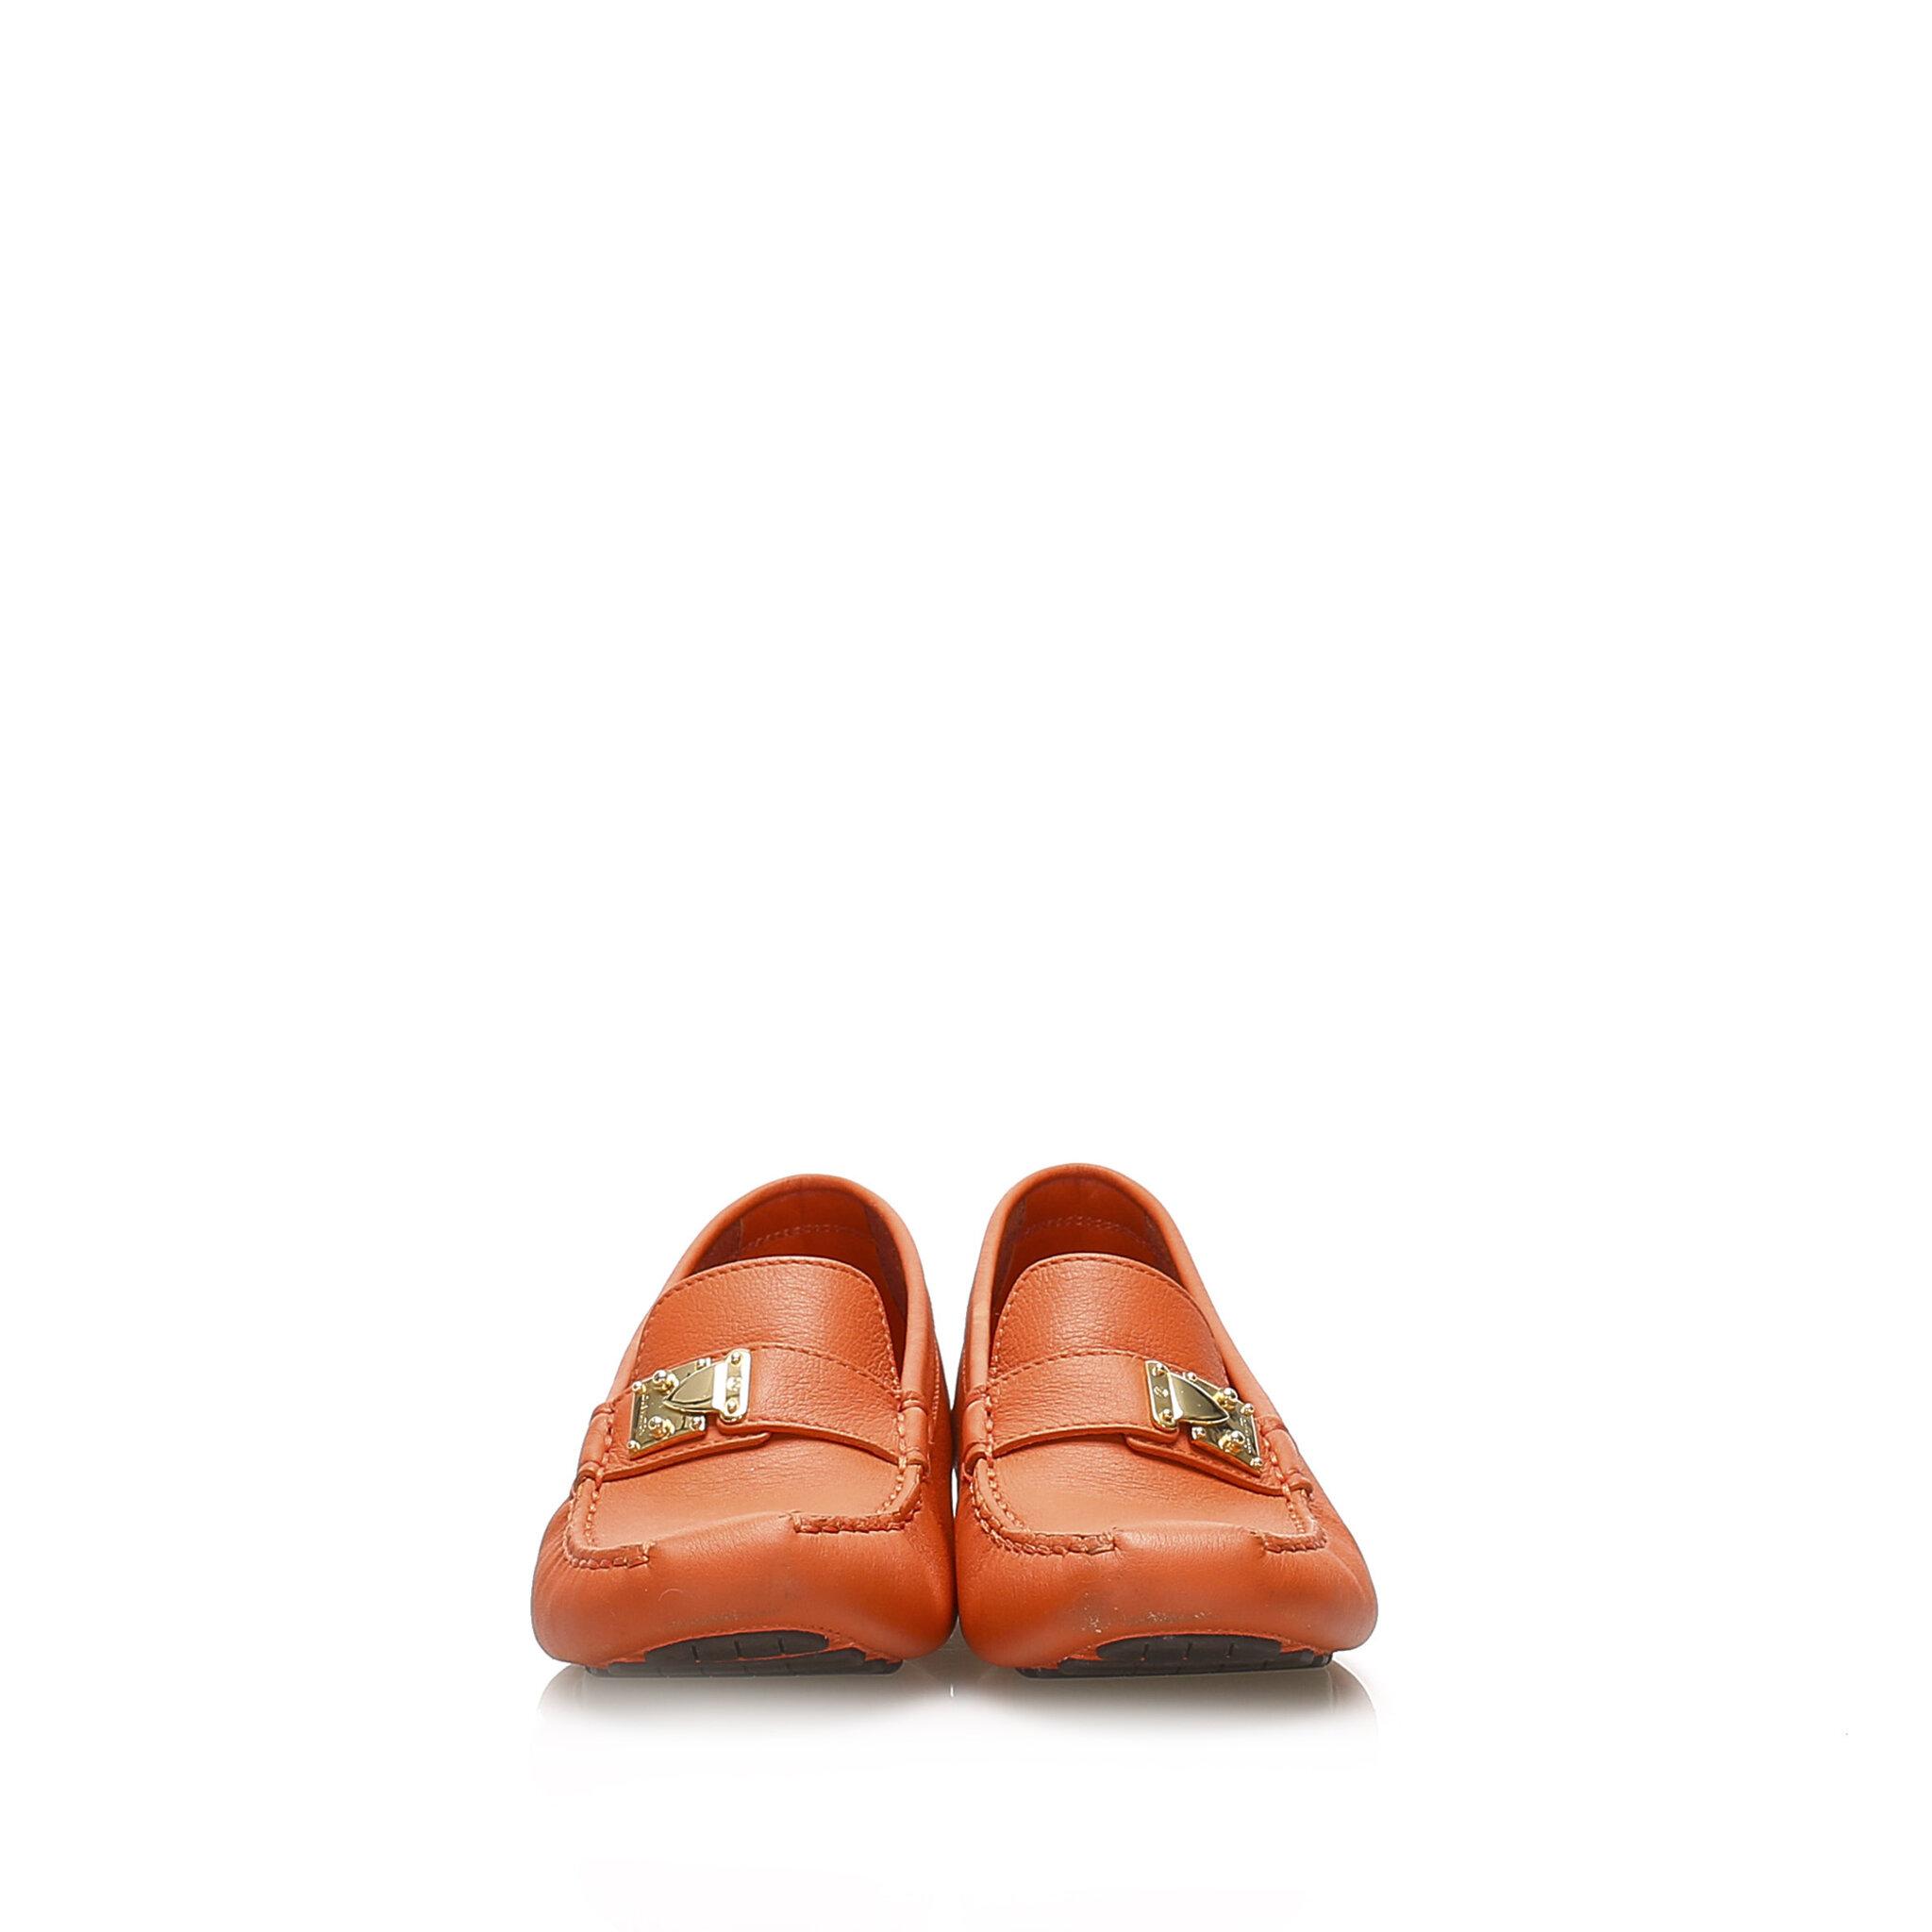 Louis Vuitton Driving Leather Shoes, 39